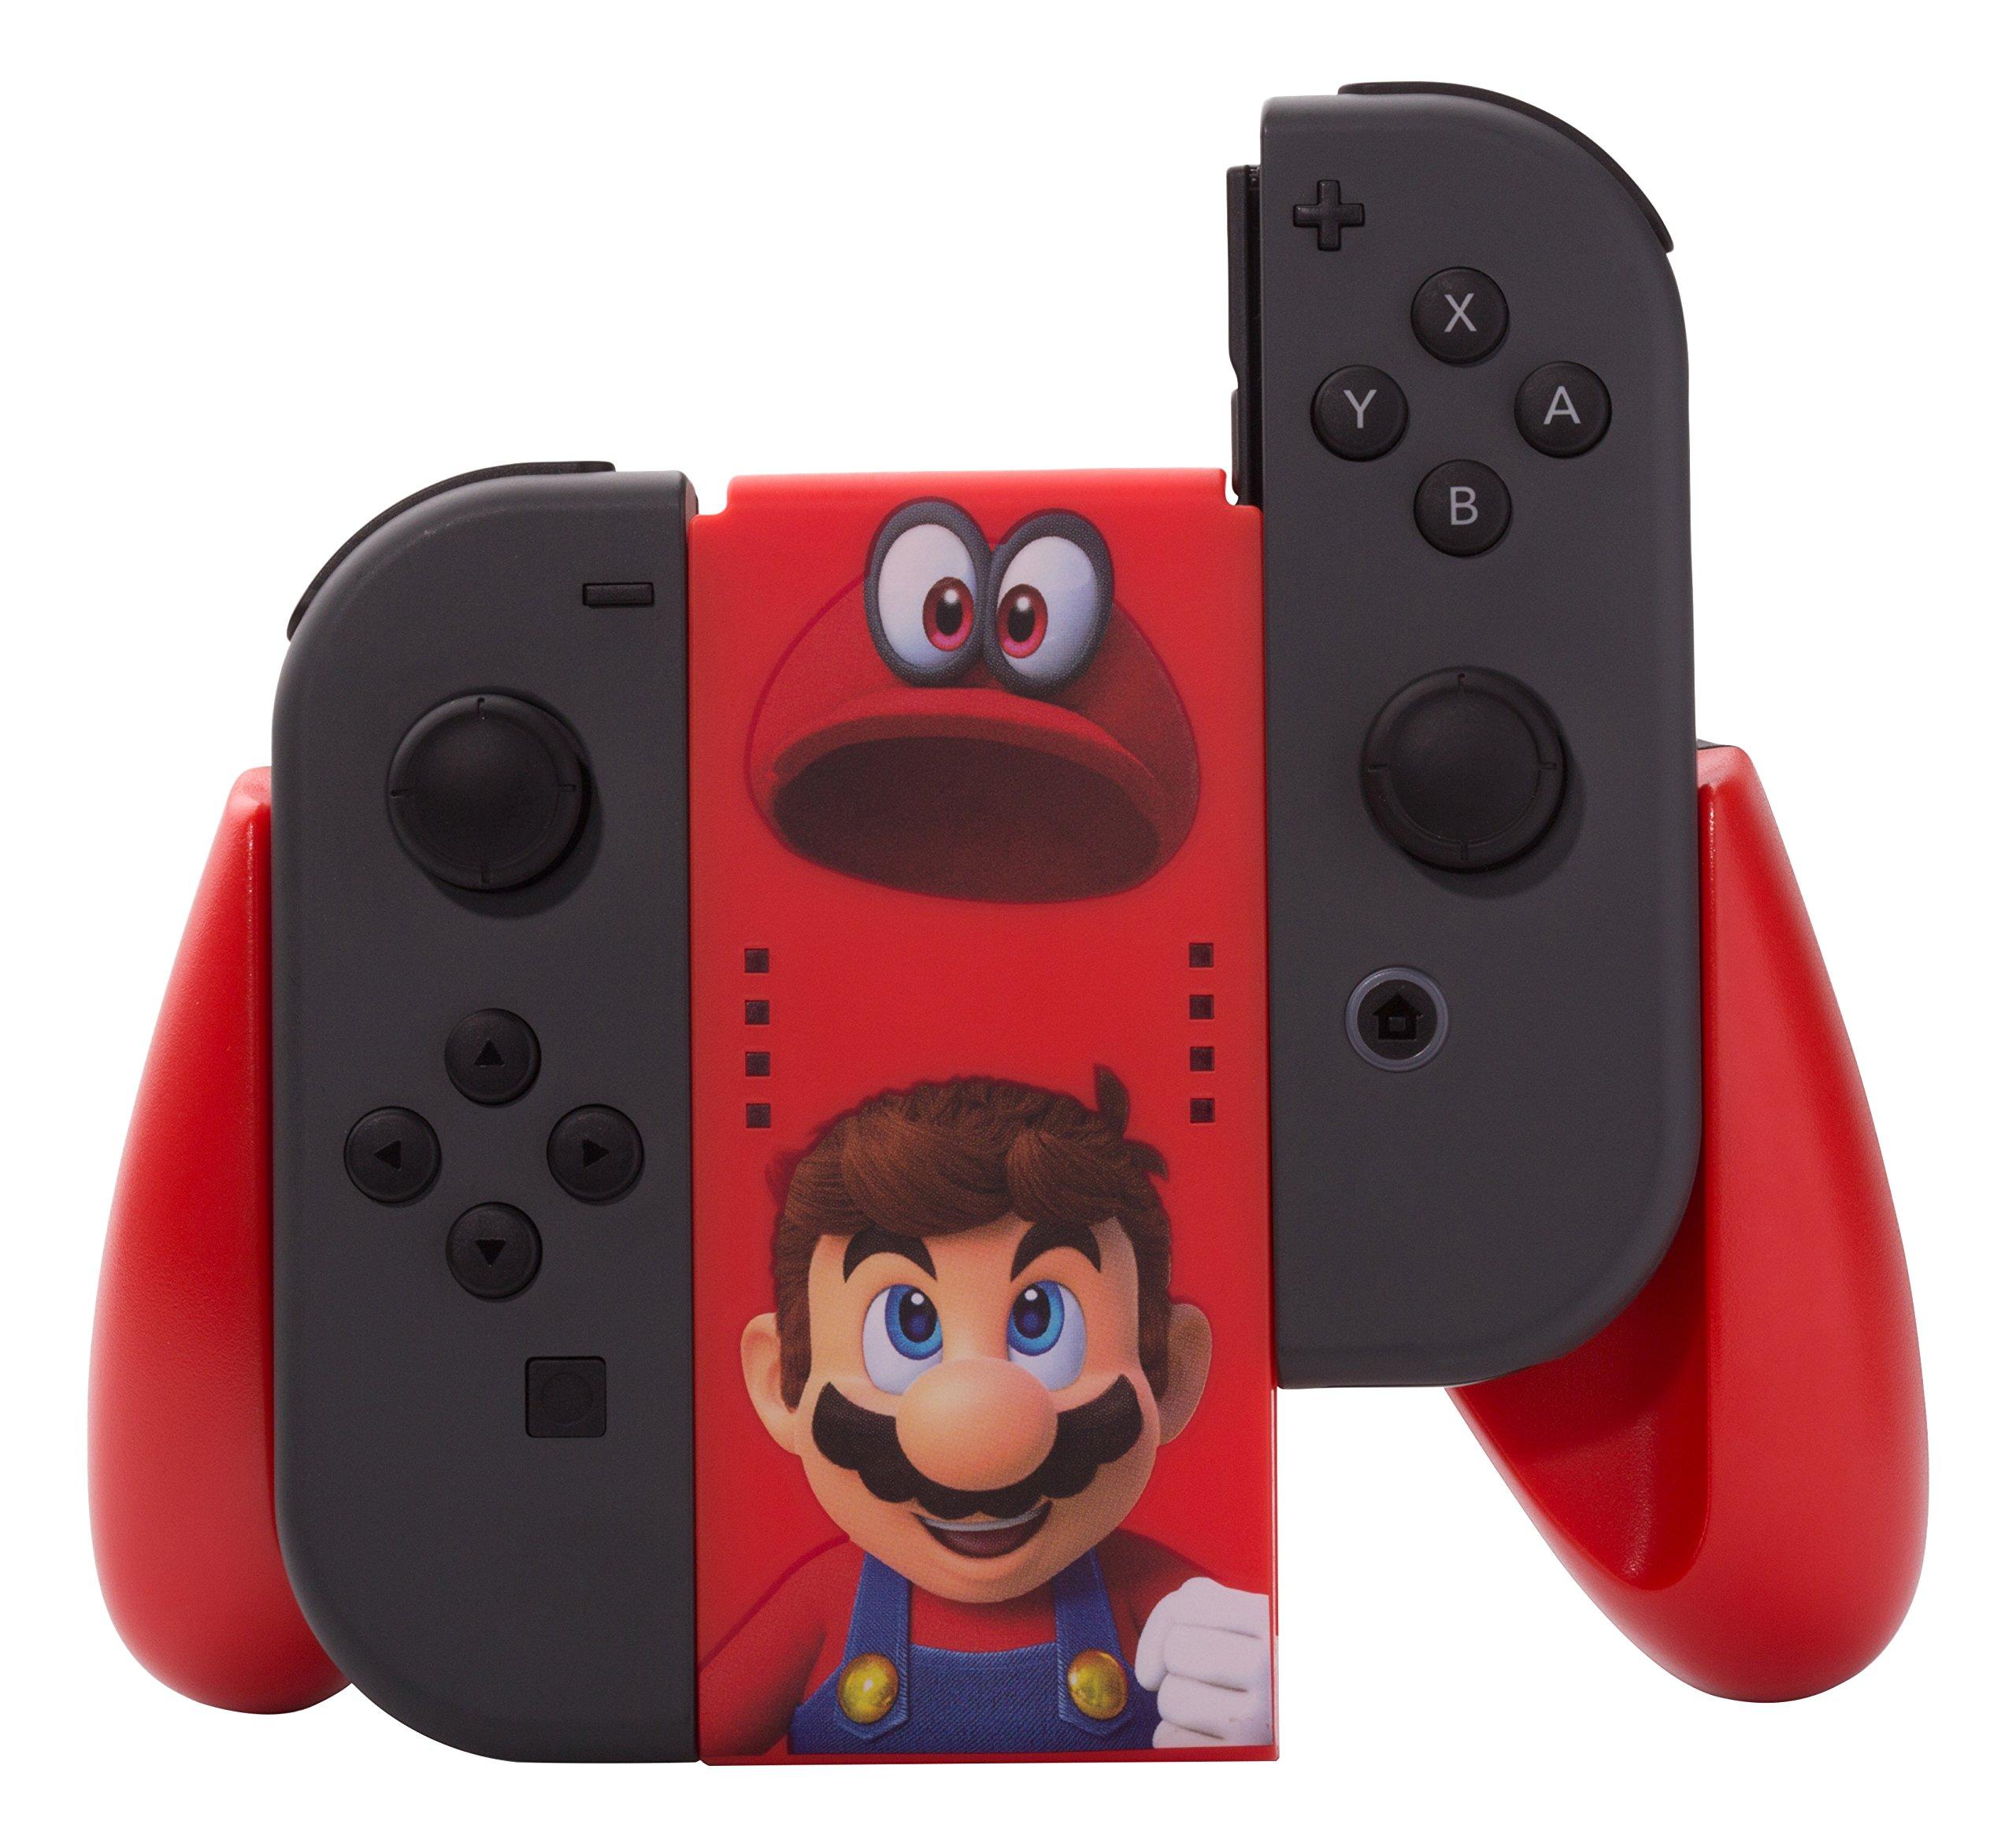 PowerA Joy-Con Comfort Grip - Super Mario Odyssey - Nintendo Switch by PowerA